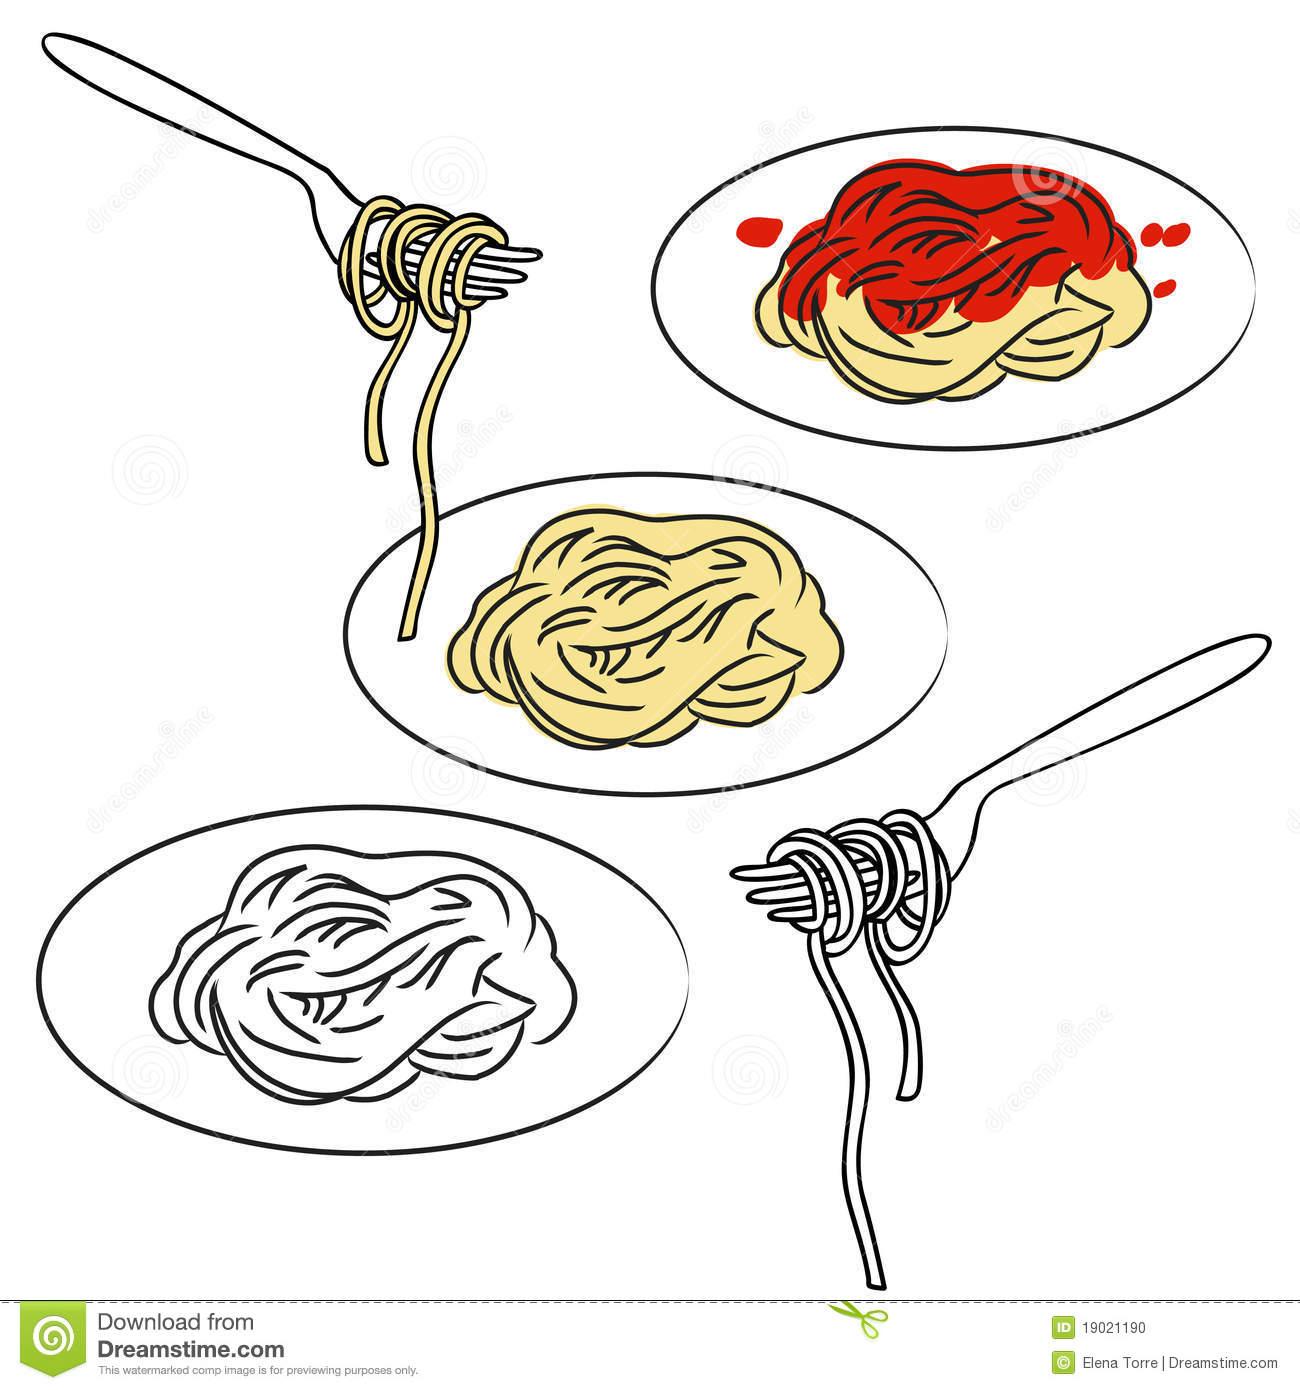 Spaghetti on a Fork Clip Art  Spaghetti on a Fork Image